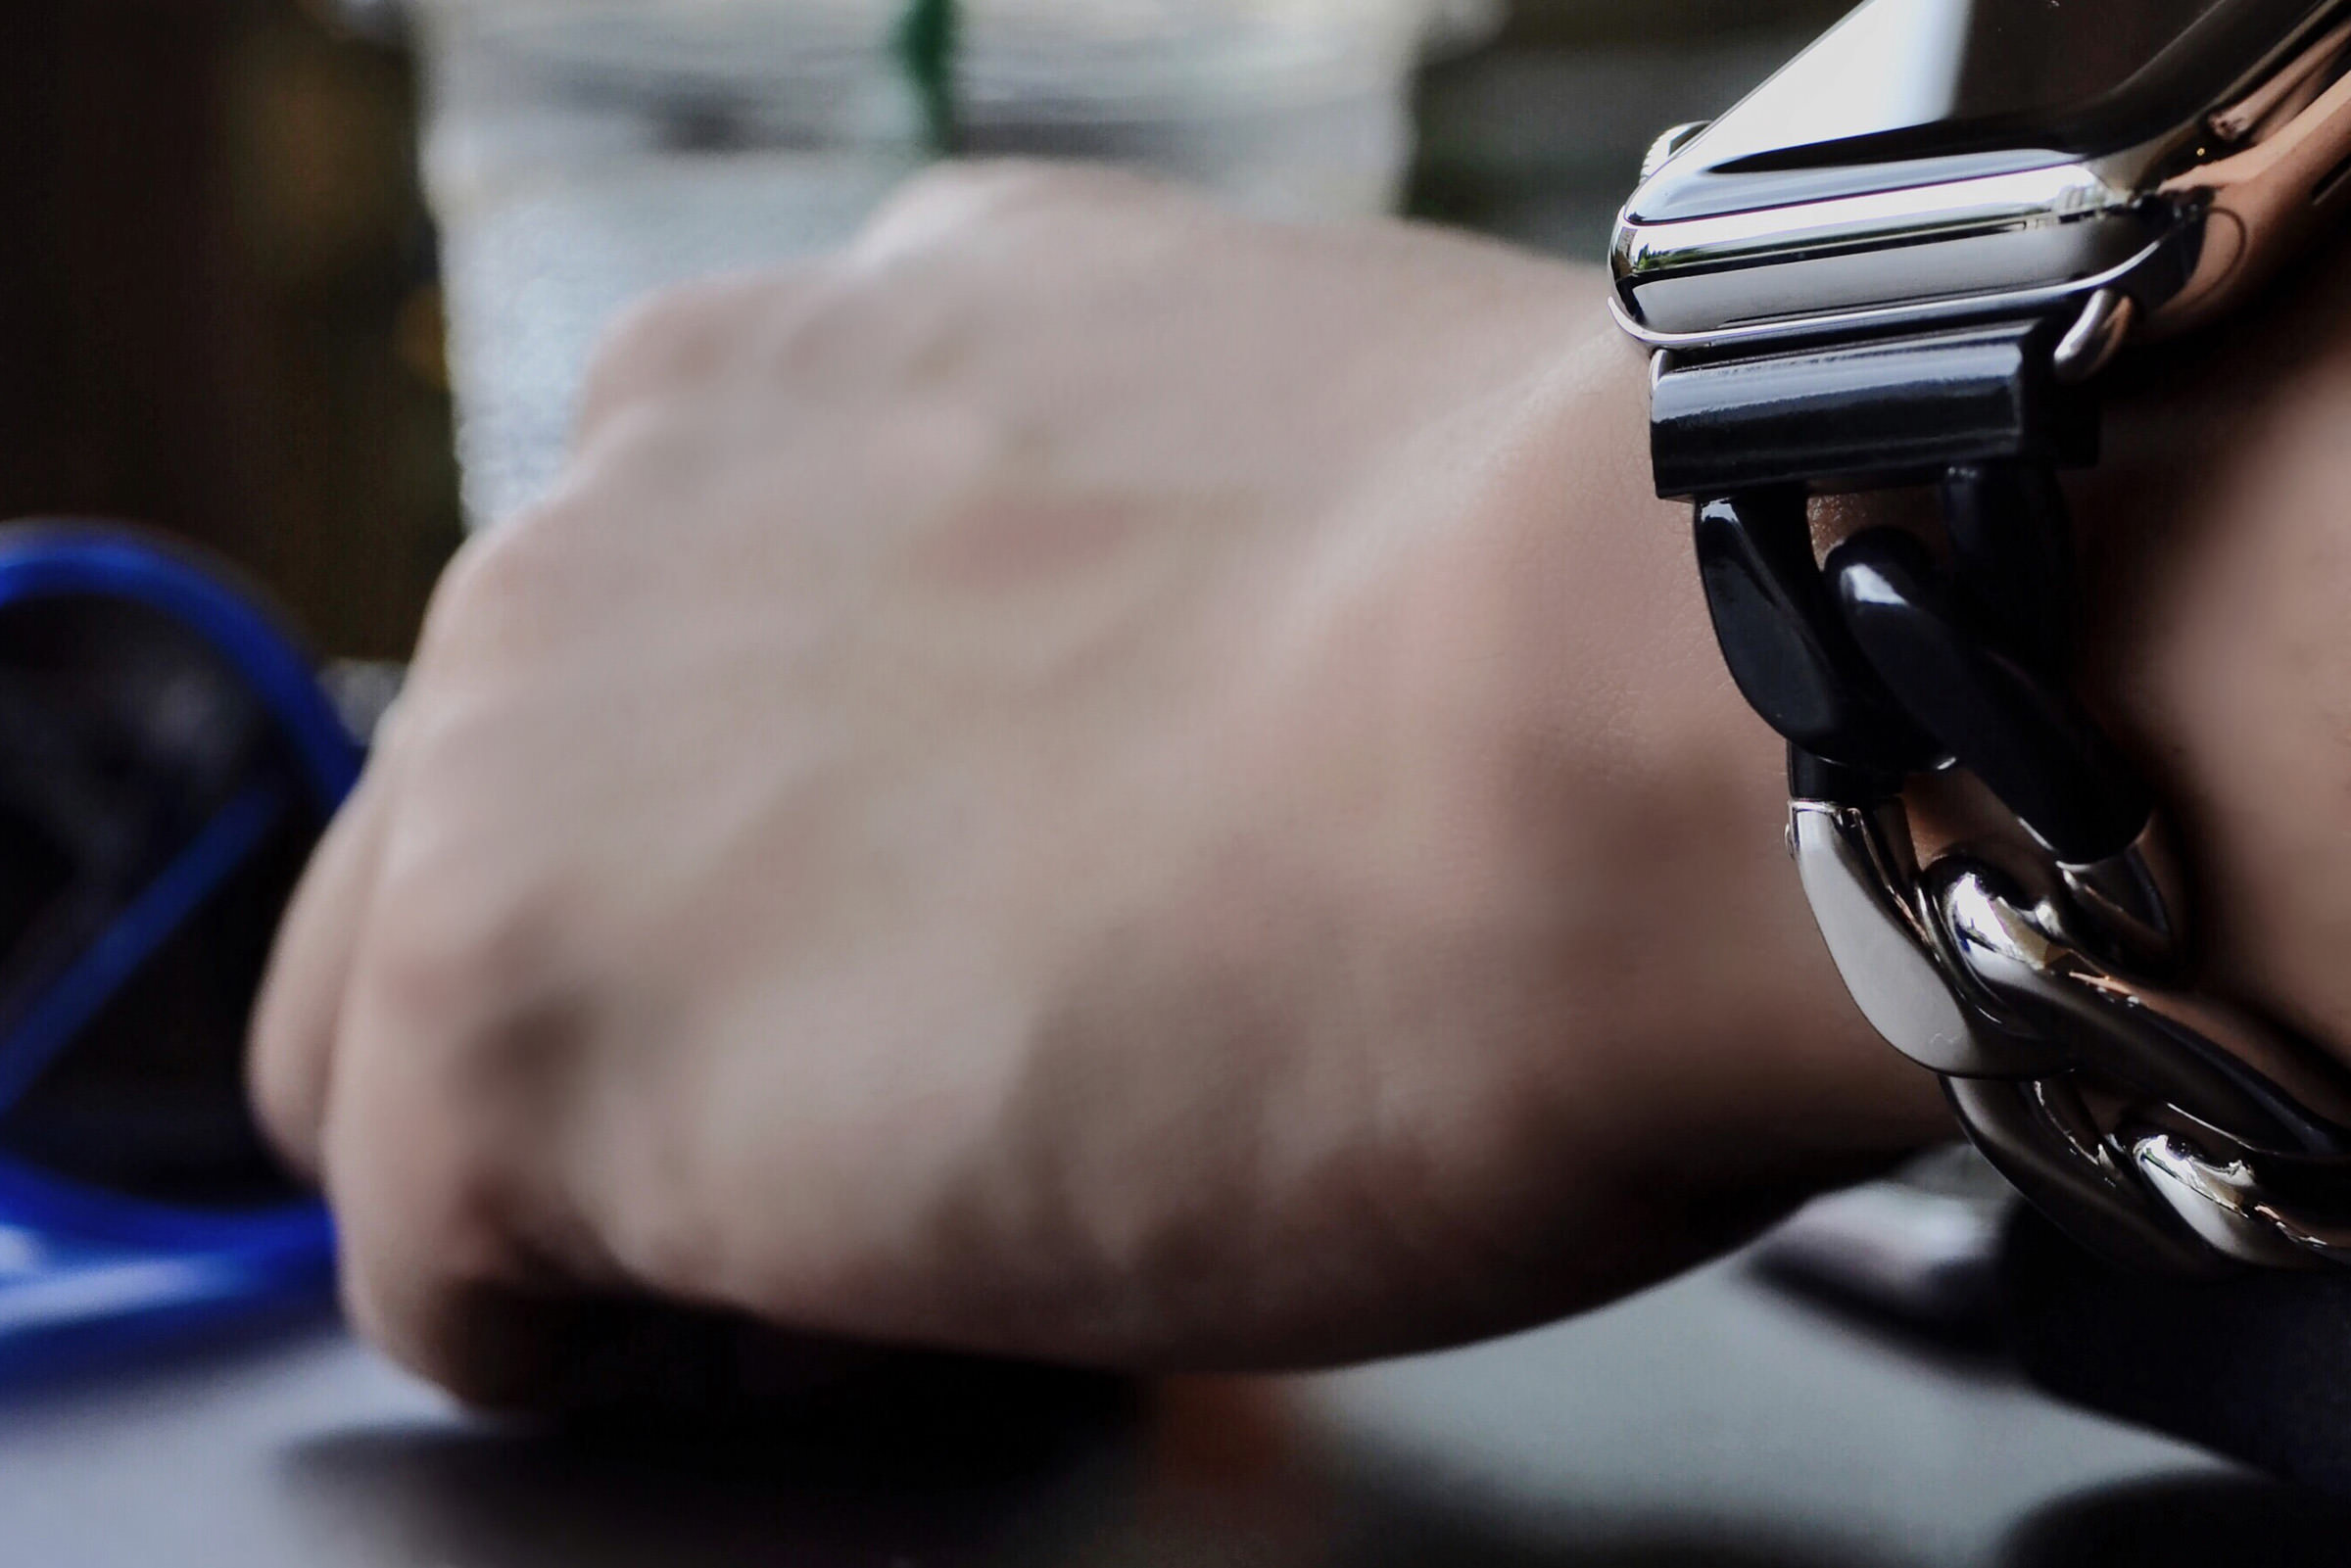 sacai for Apple Watch LIFEWARES inc.